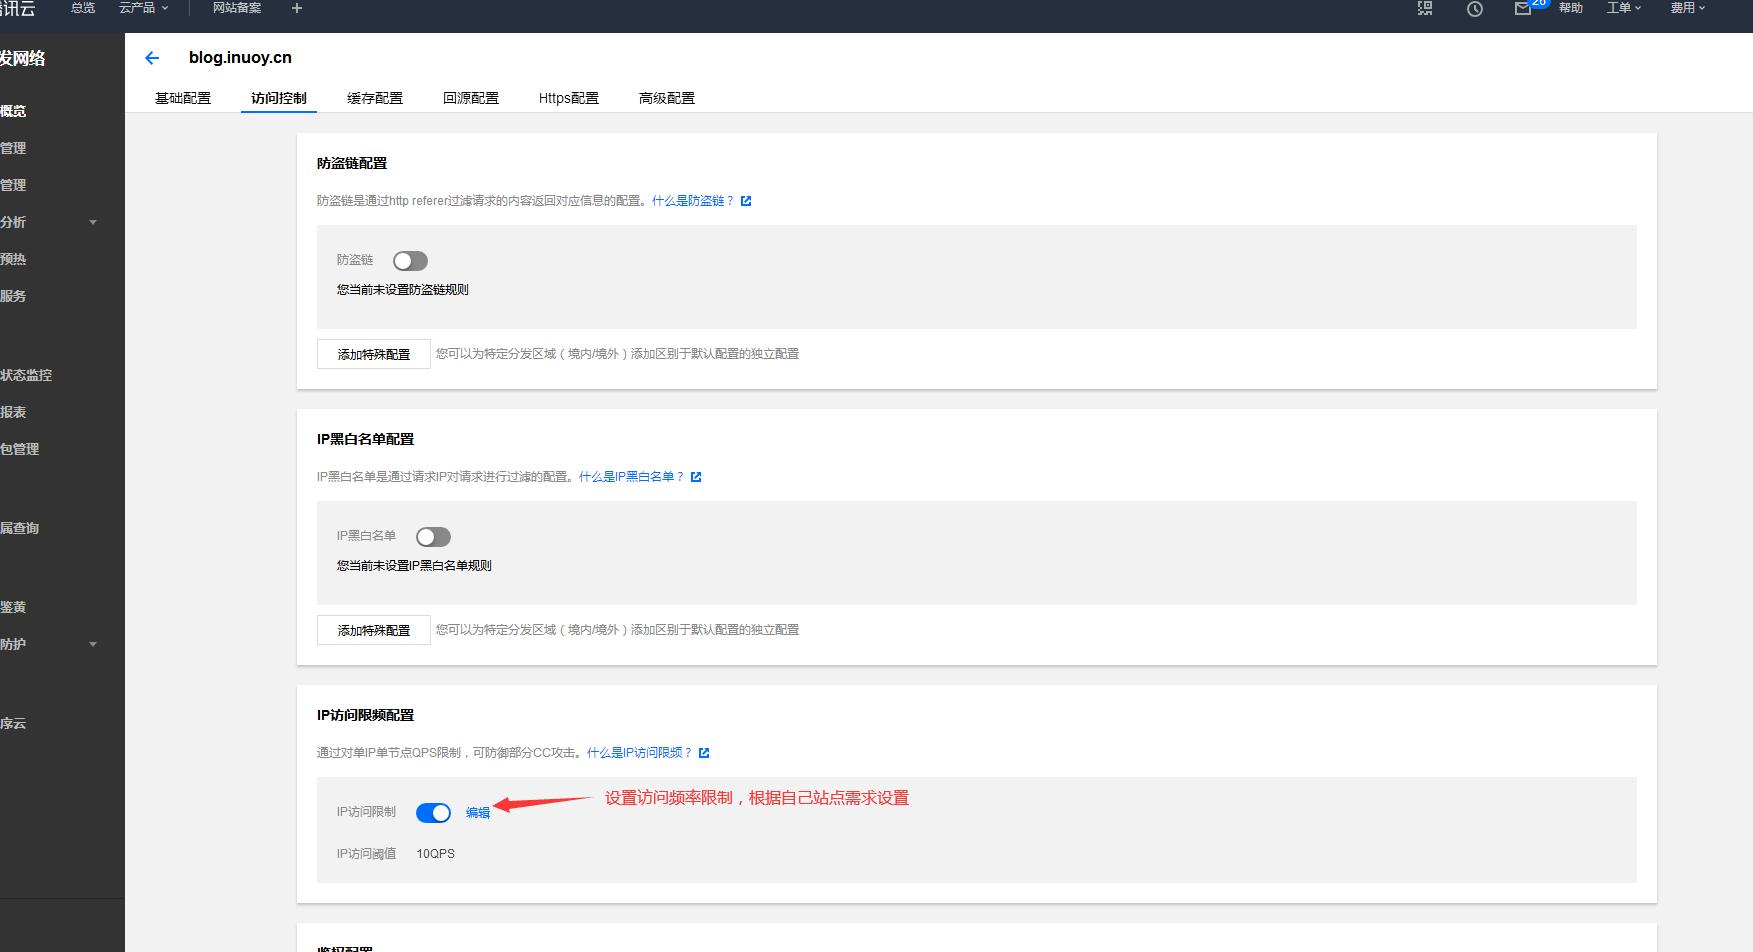 CDN域名管理 访问控制